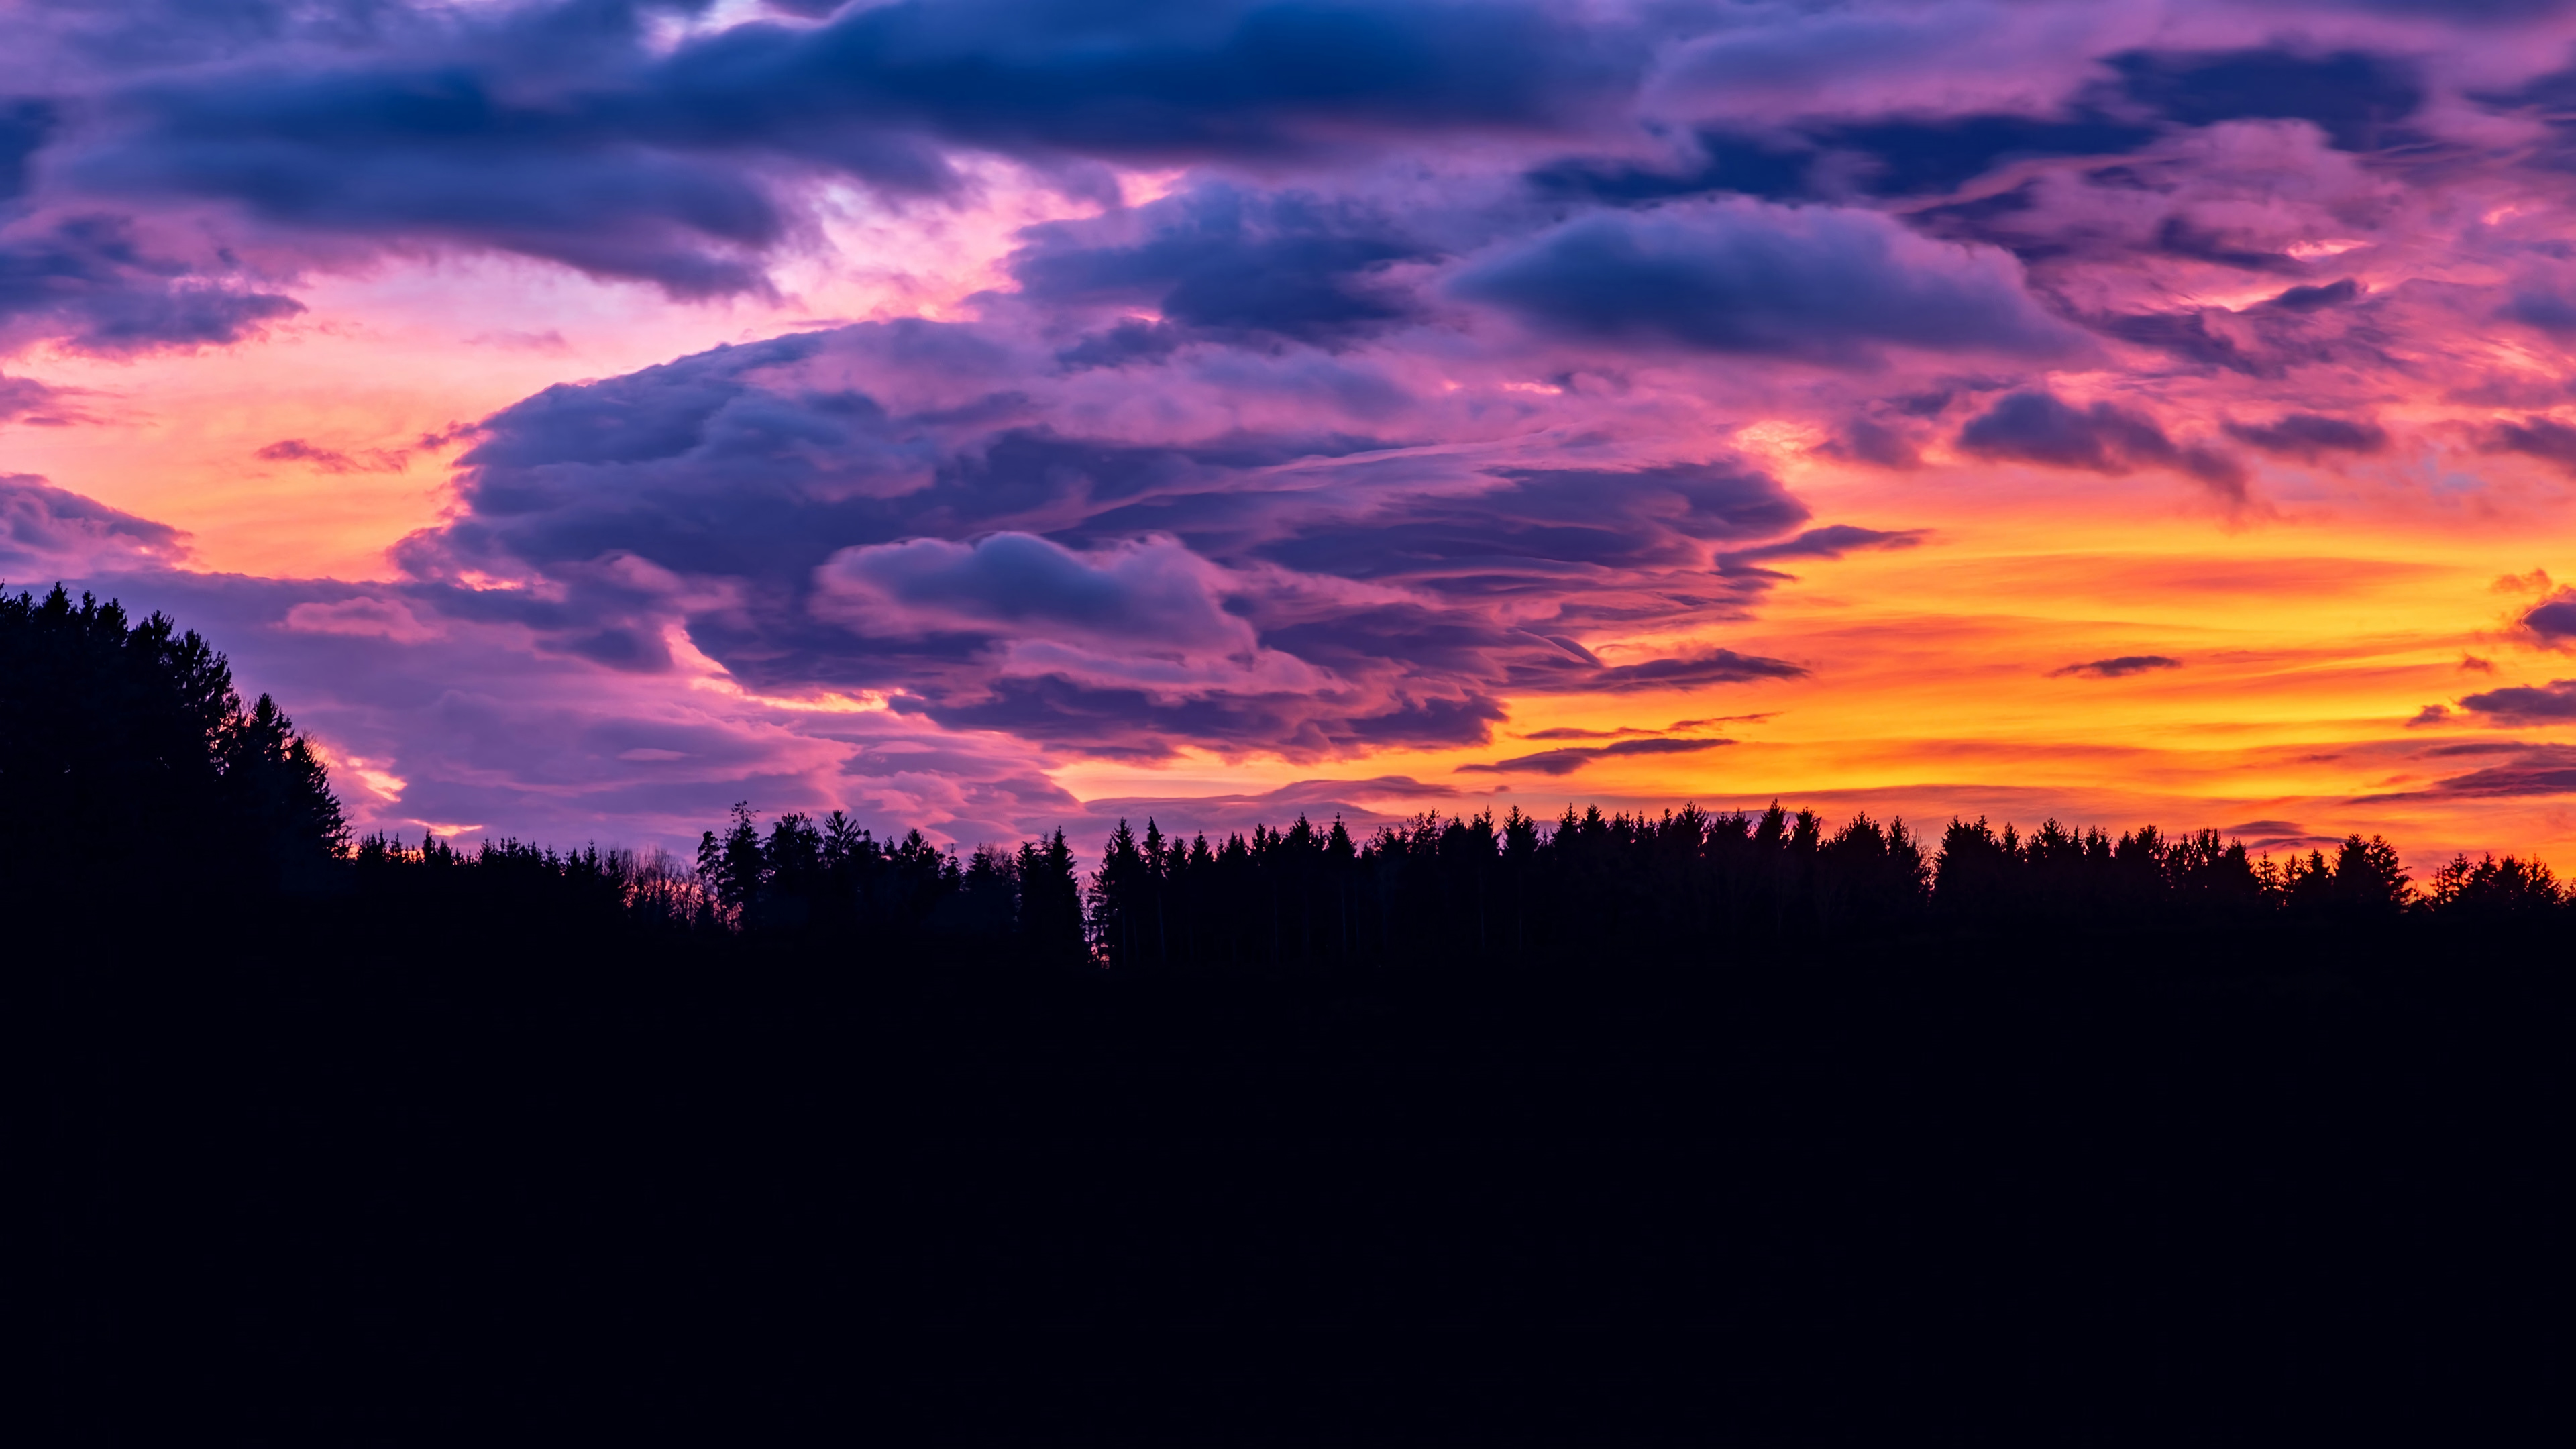 purple clouds at sunset 4k ultra hd wallpaper background image 3840x2160 id 1057672 wallpaper abyss purple clouds at sunset 4k ultra hd